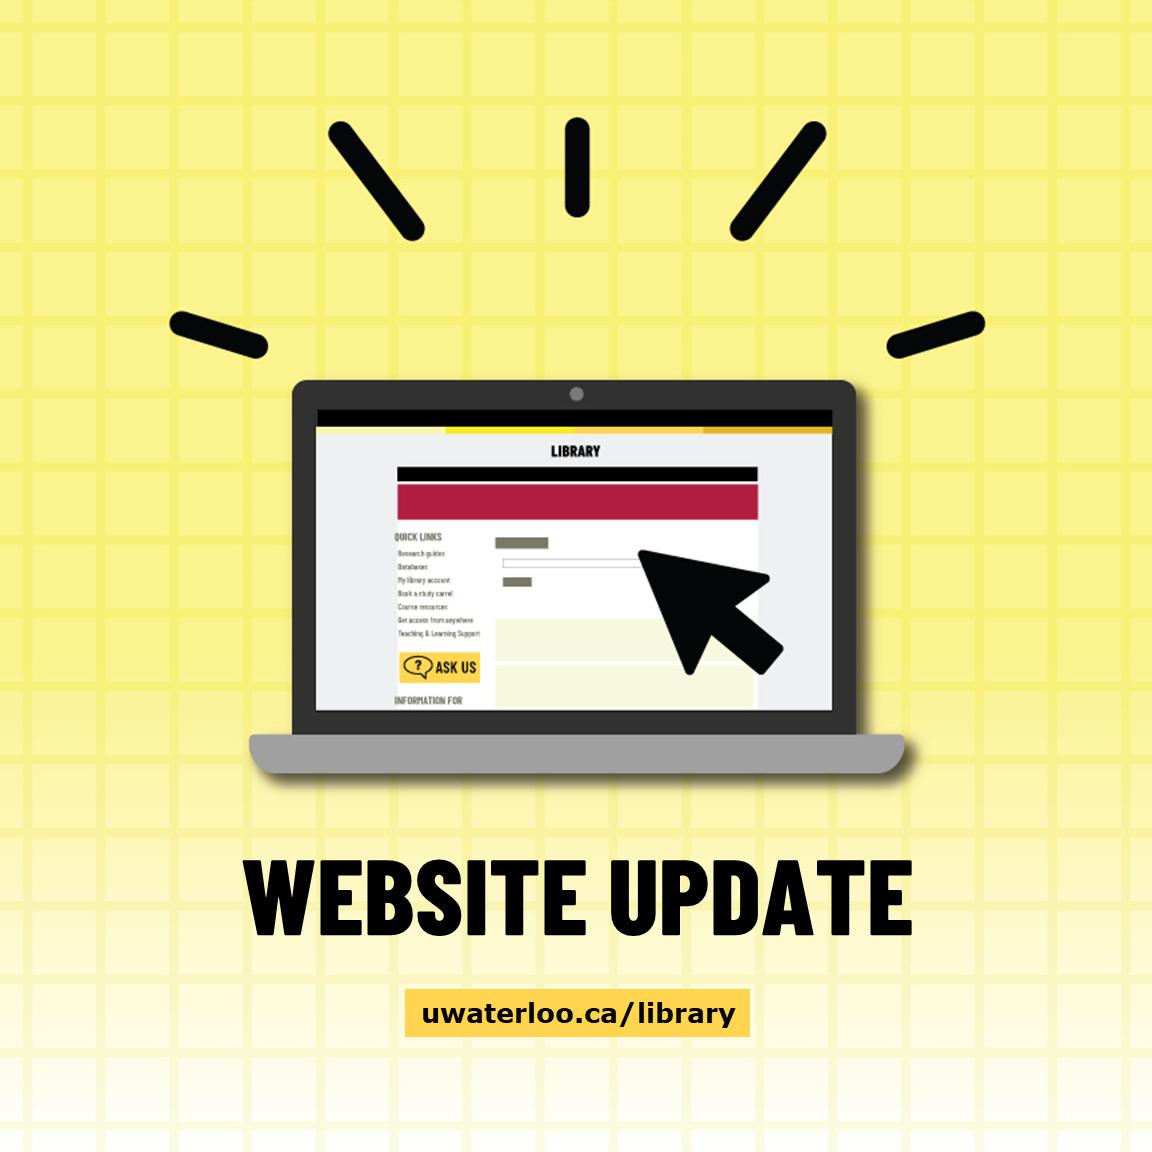 Website update uwaterloo.ca/library